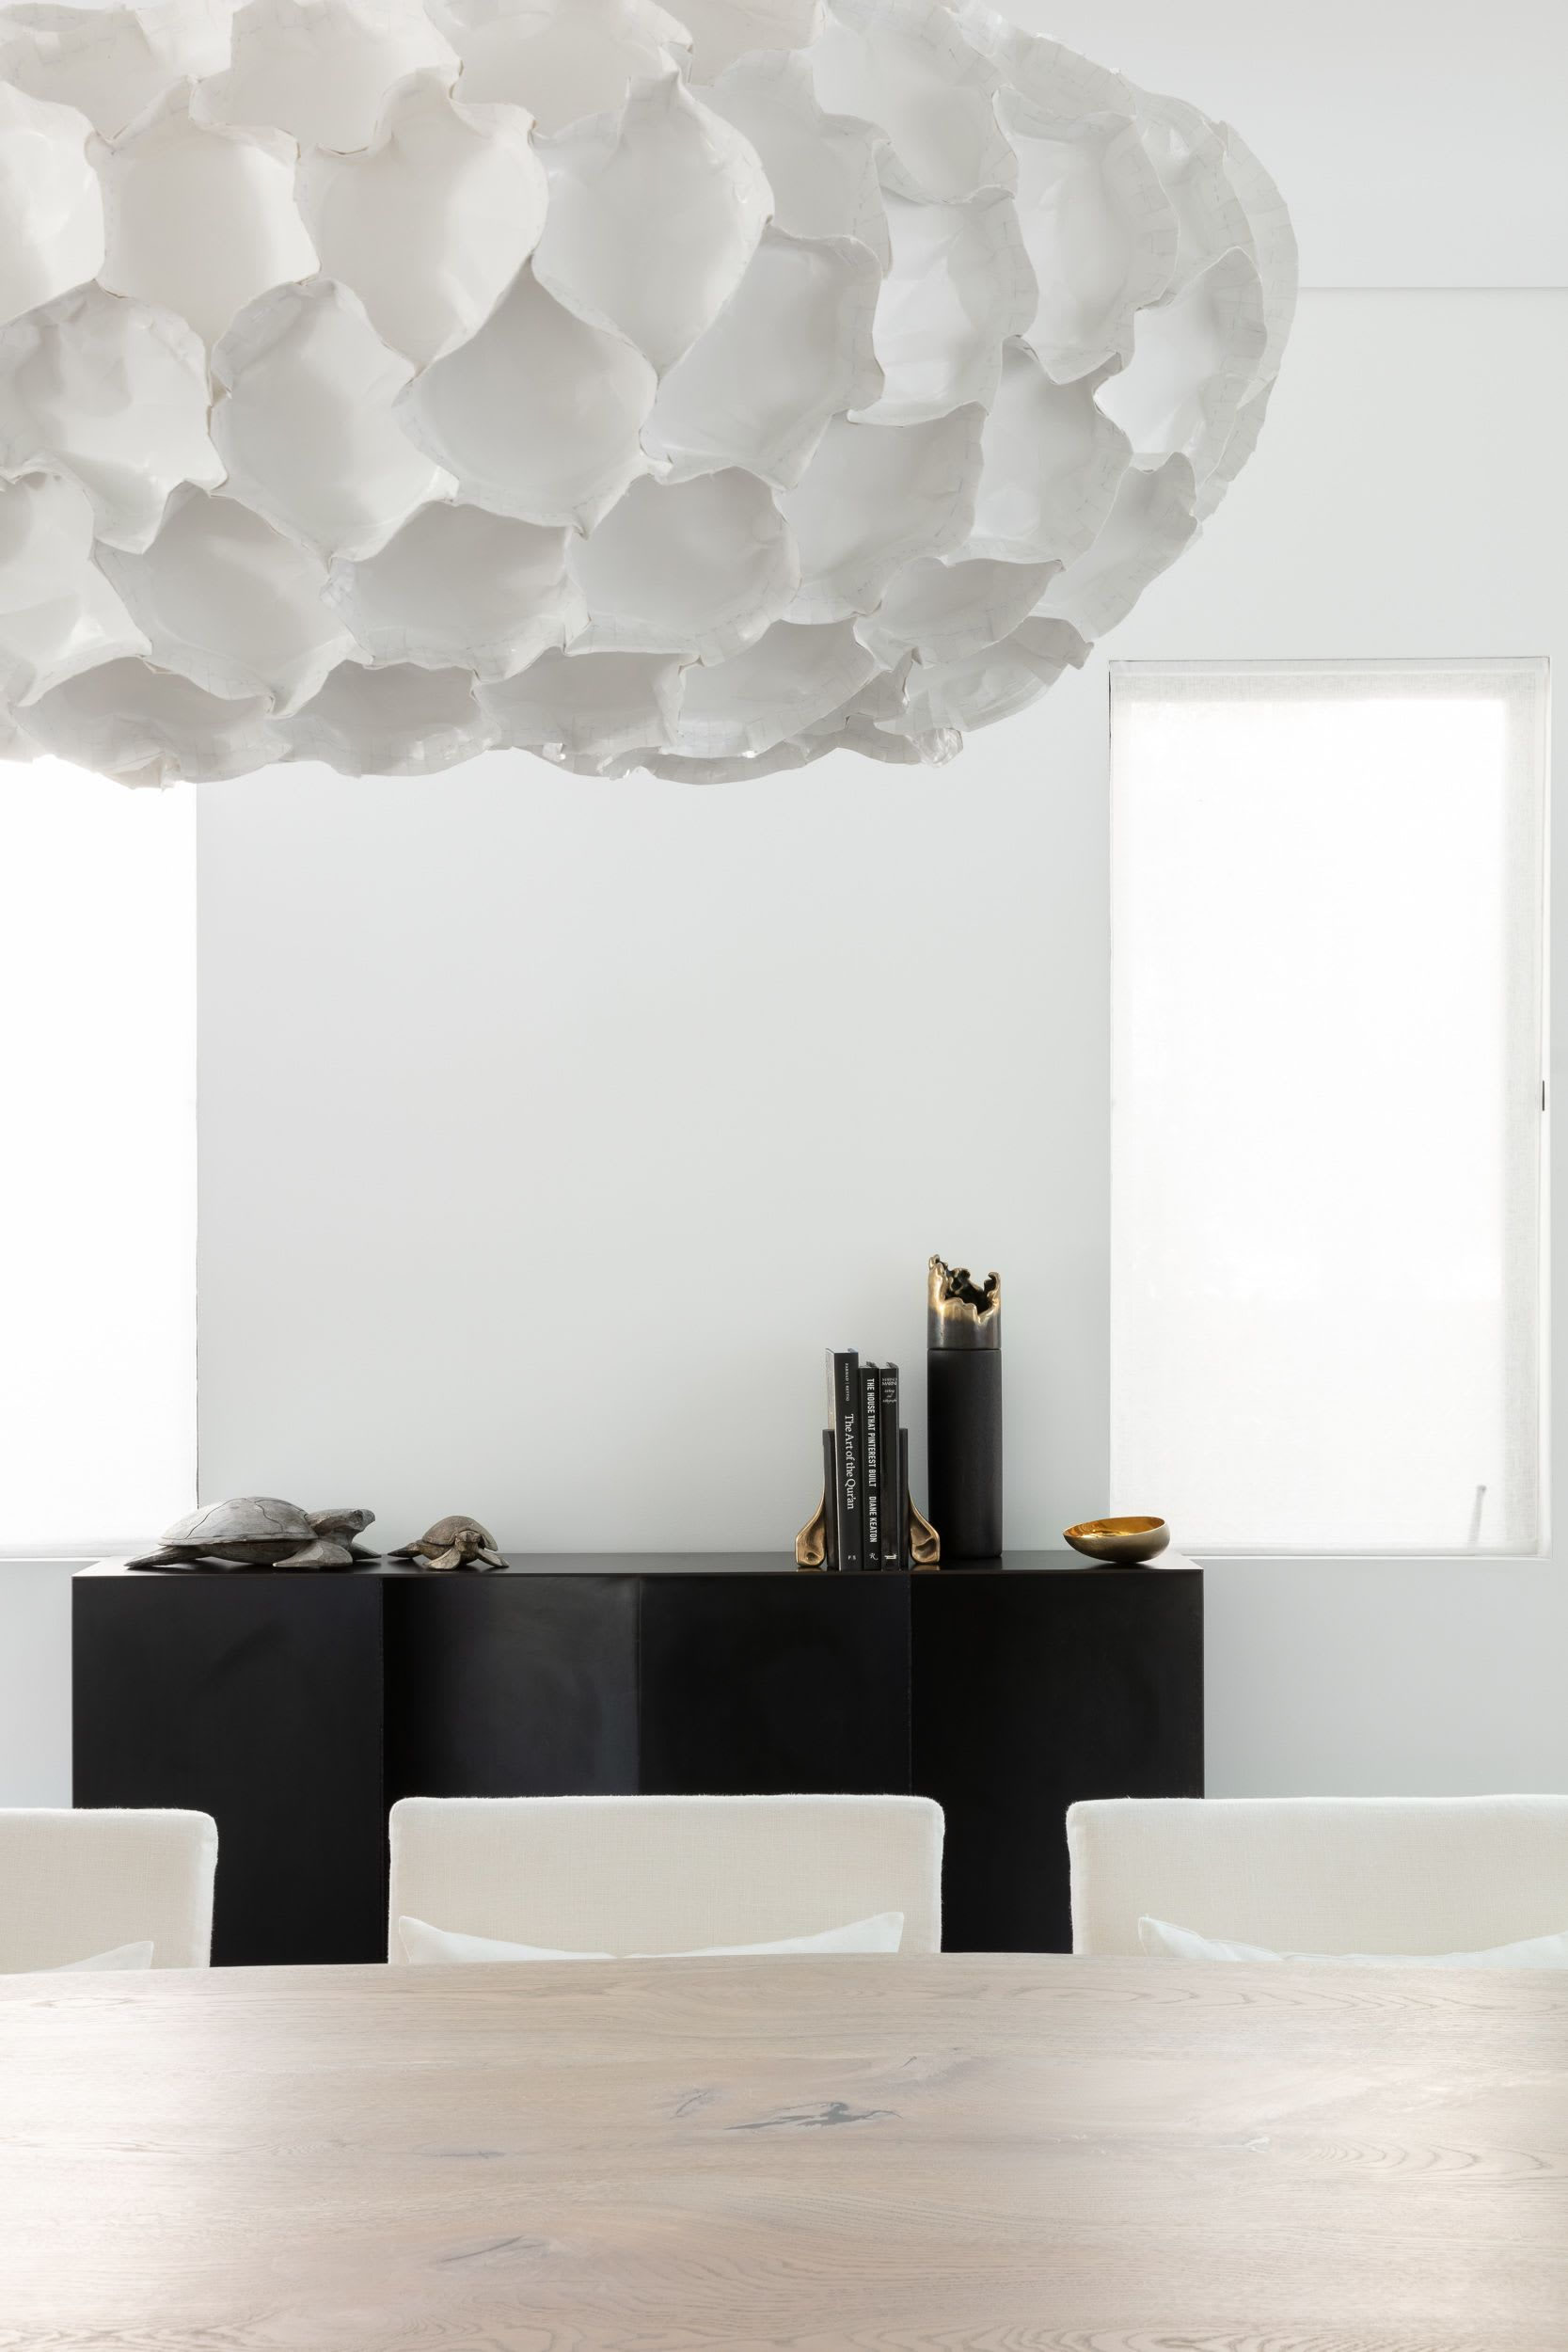 Interior Design by Cuff Studio seen at Private Residence, Los Angeles - Interior Design